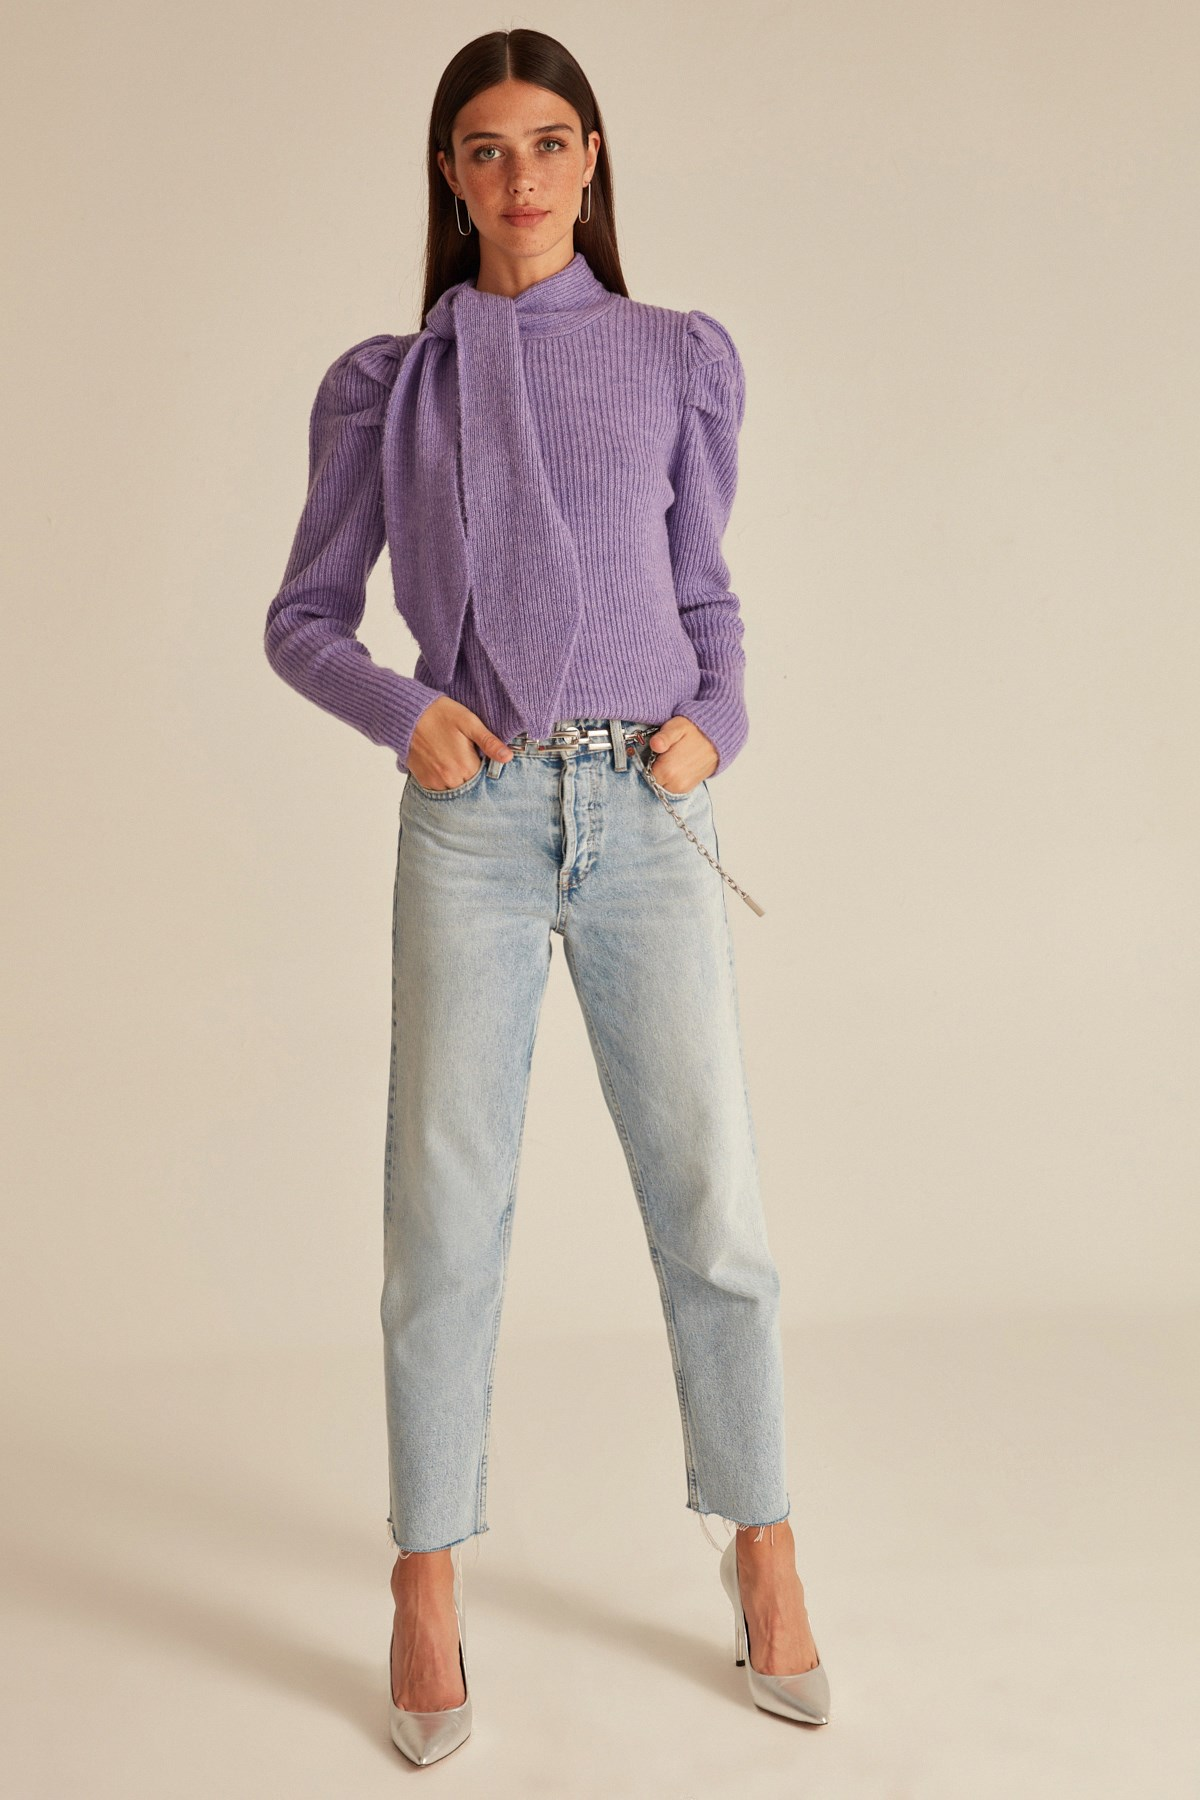 Lacing Neckline Shirred Bubble Shoulder Knitwear Sweater свитер женский кофта женская Cardigan Women Sexy Lady Wear